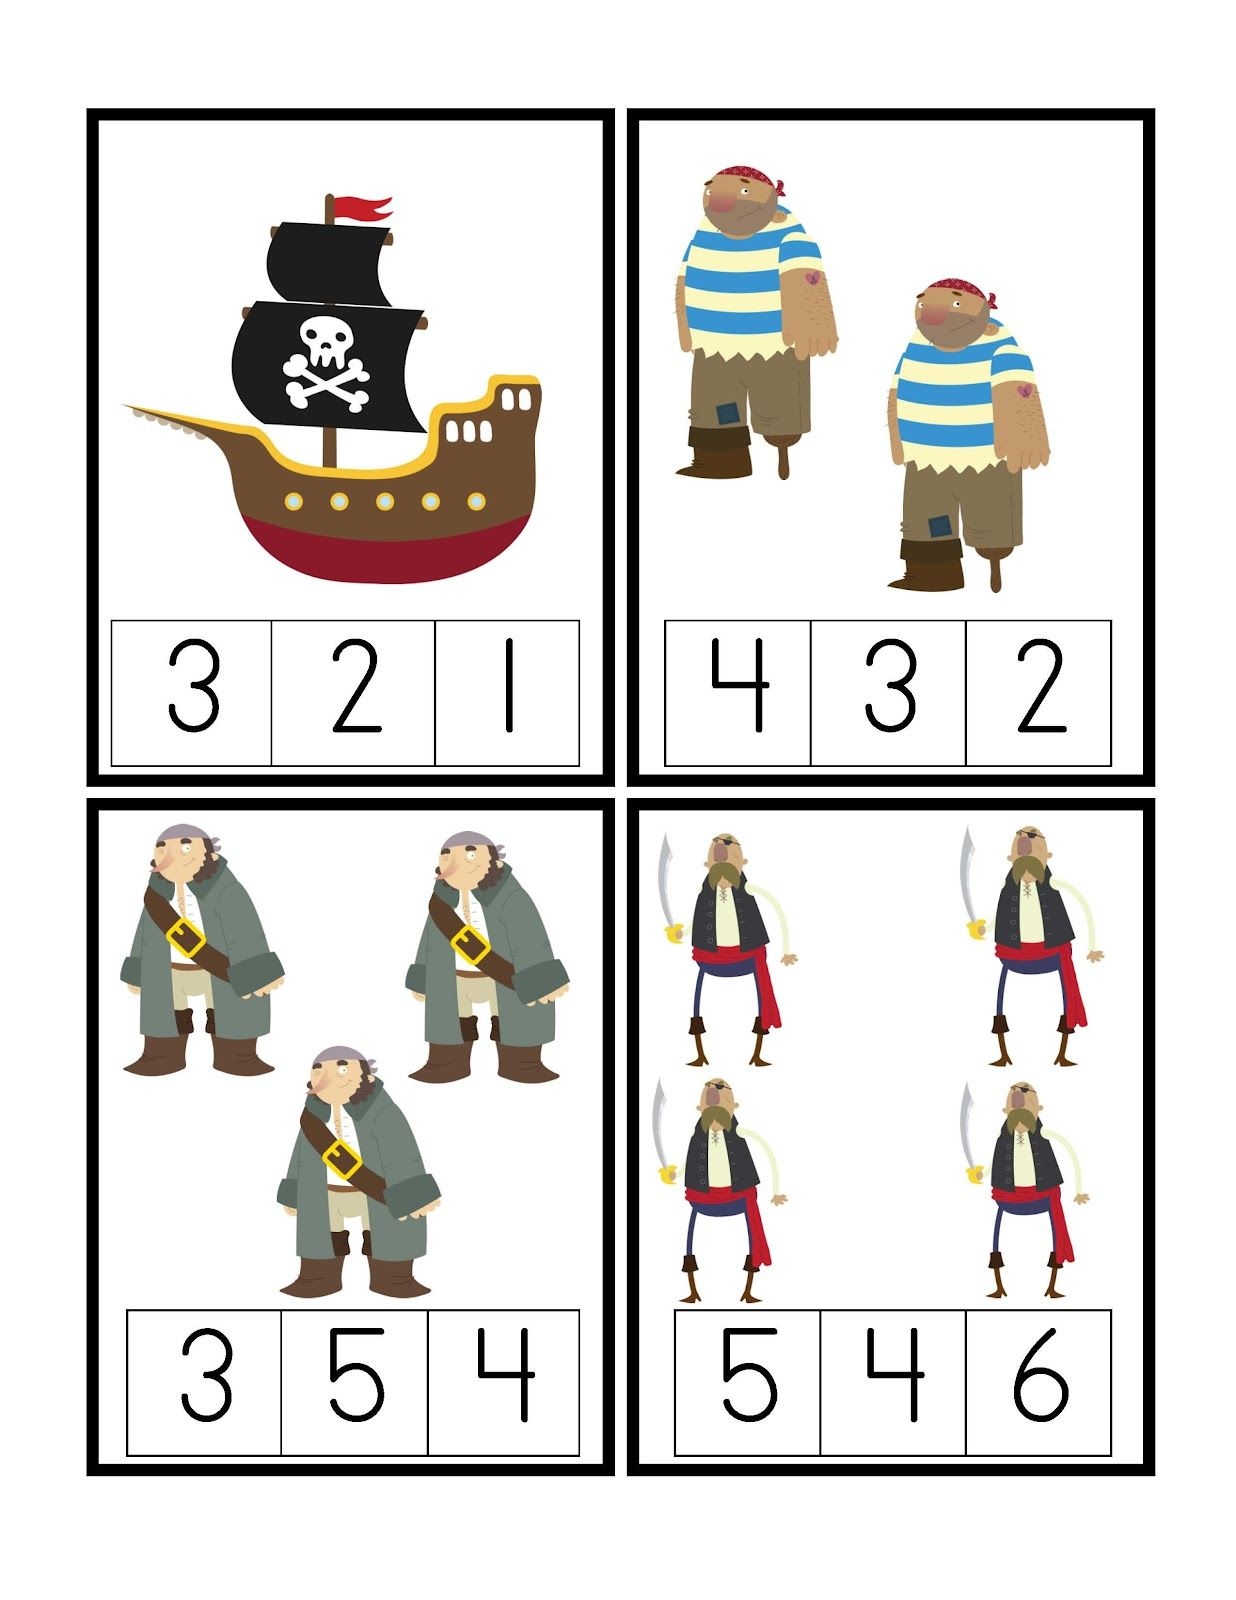 Preschool Printables Pirate Preschool Pirate Theme Pirate Preschool Preschool Printables [ 1600 x 1236 Pixel ]